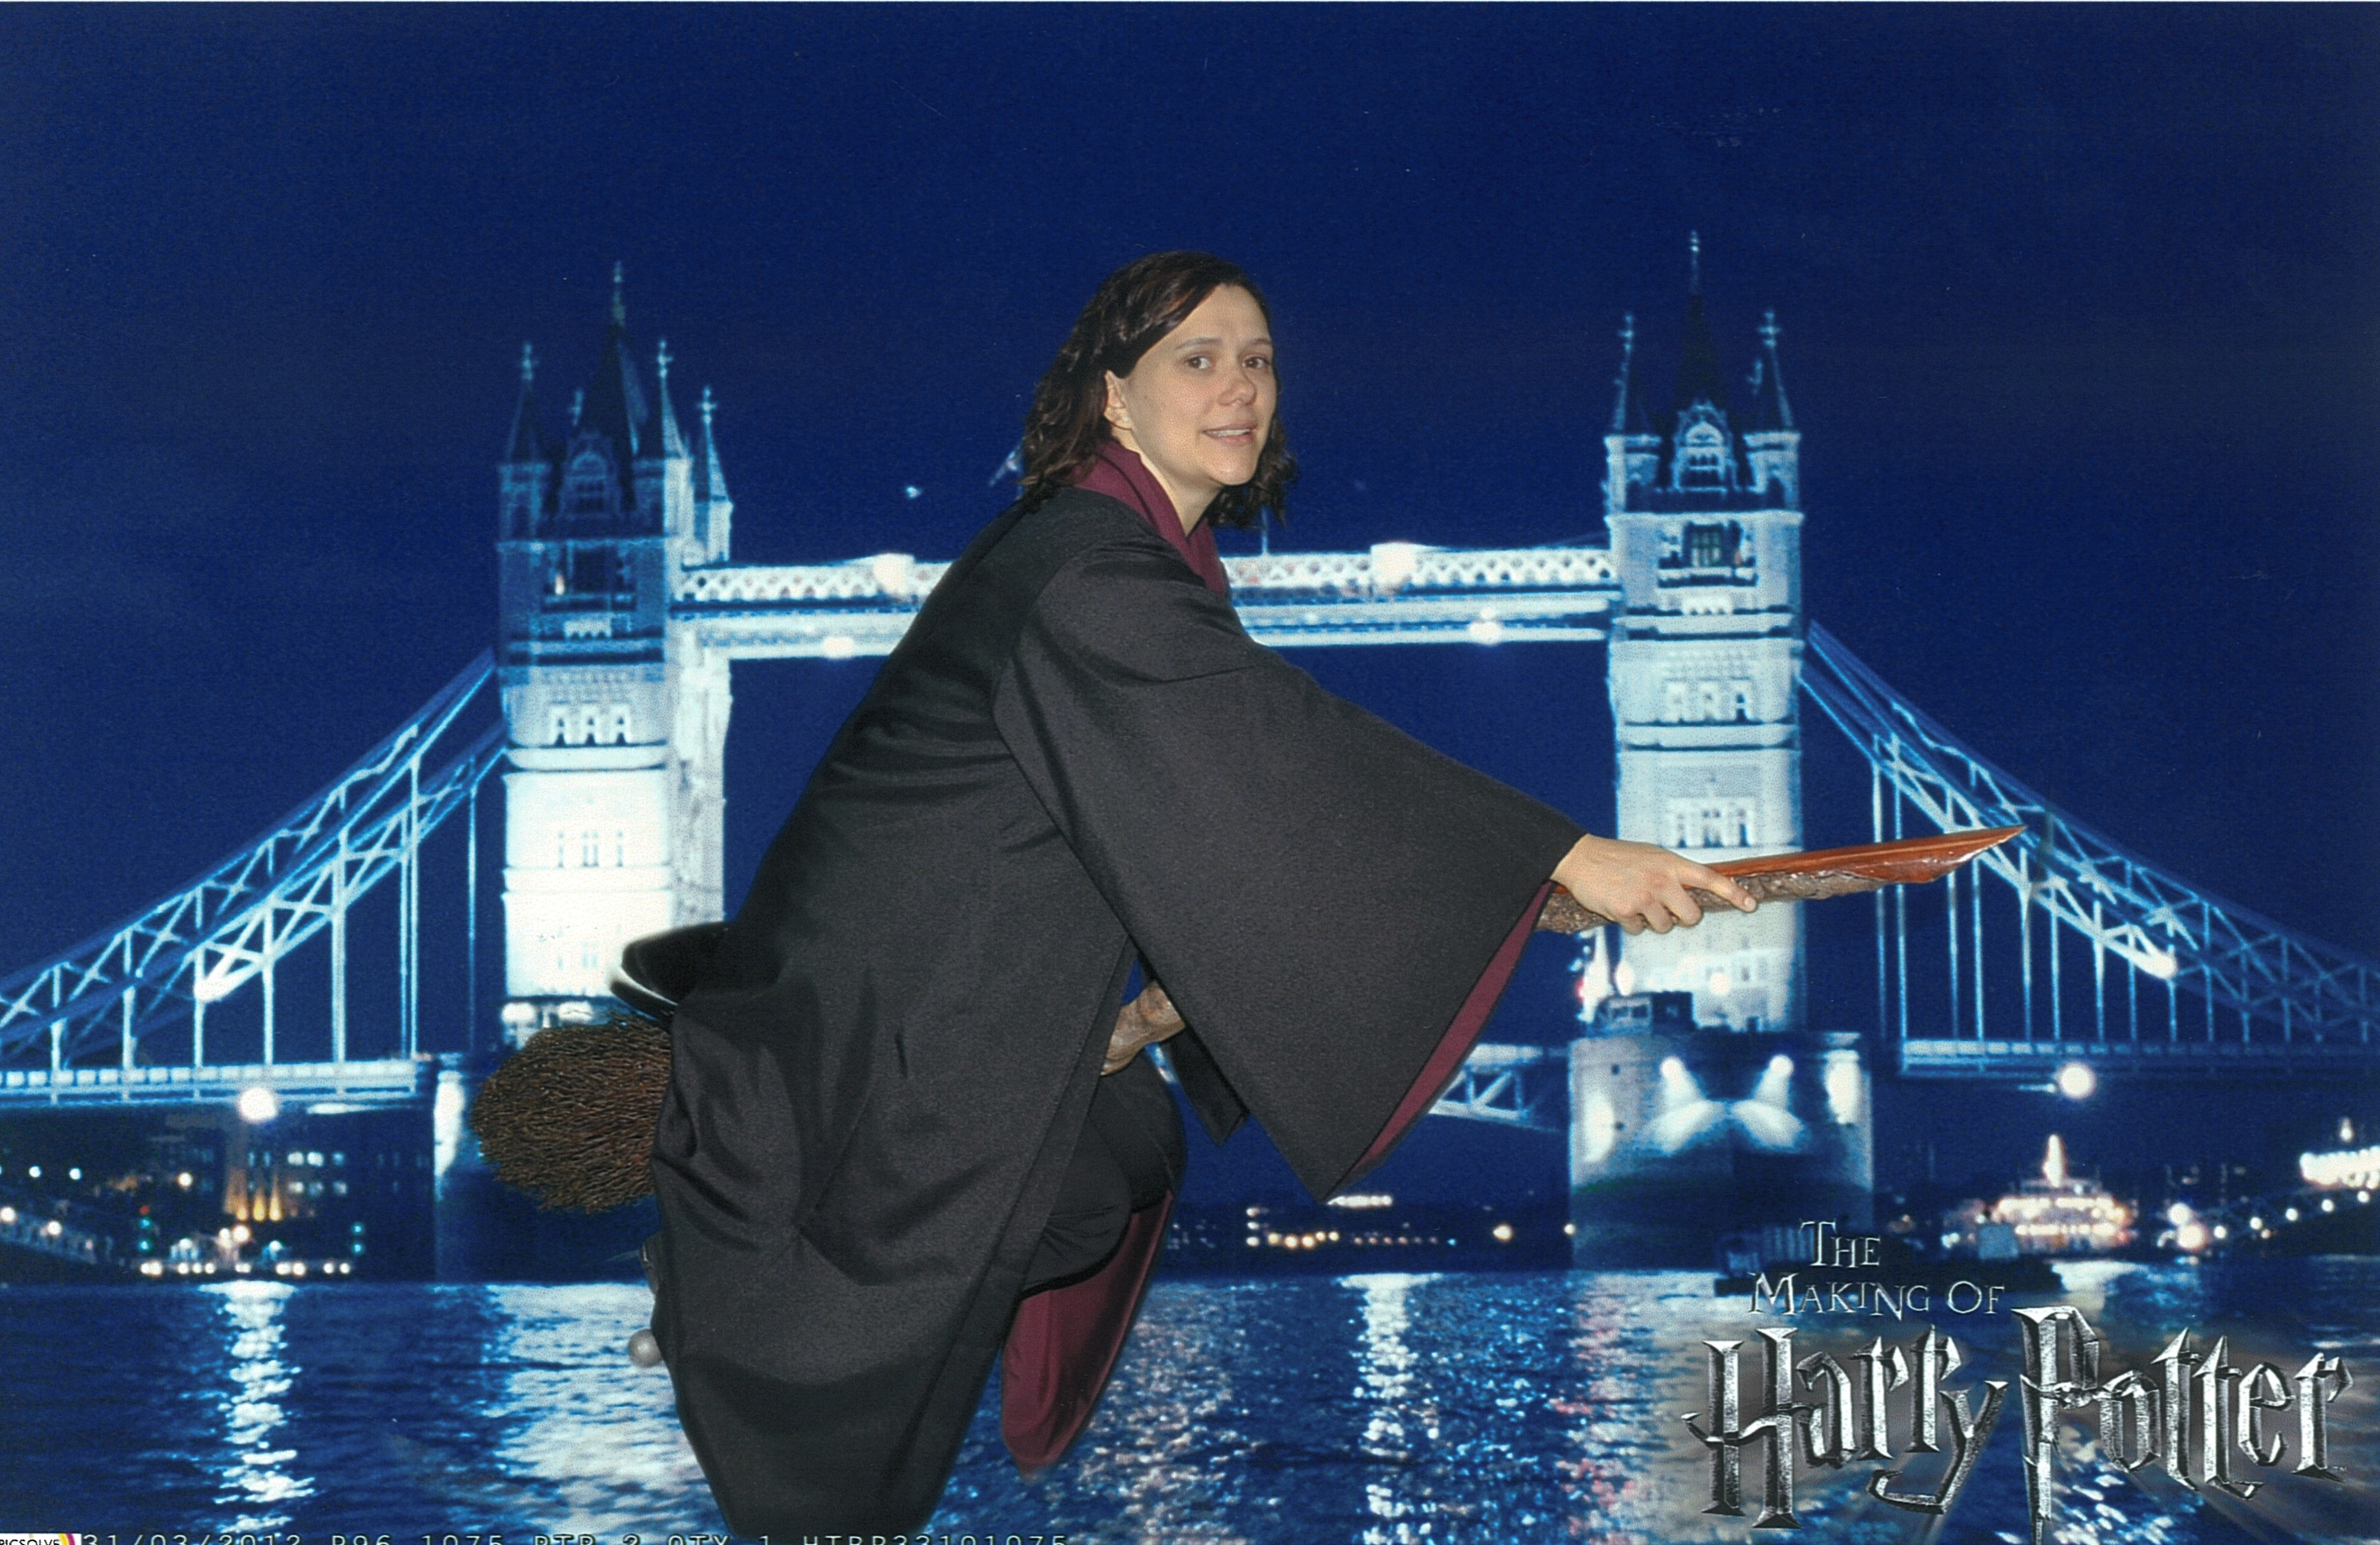 Harry Potter Studio  cataiharrypottertour